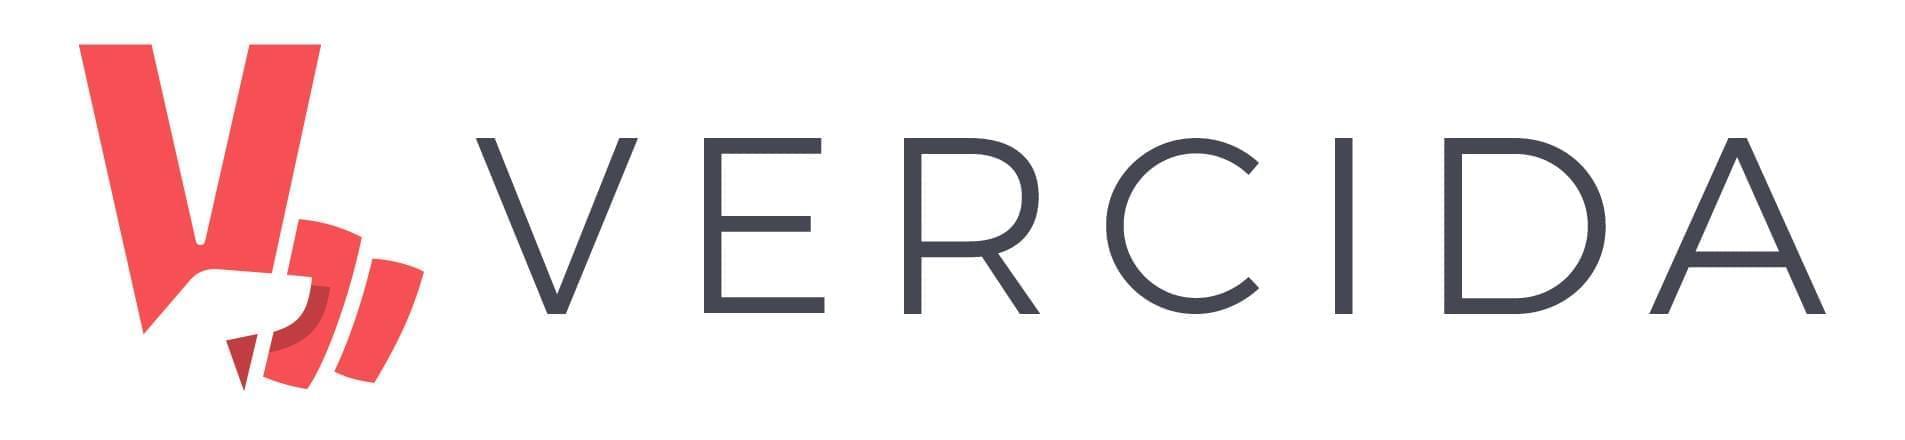 Vercida Logo